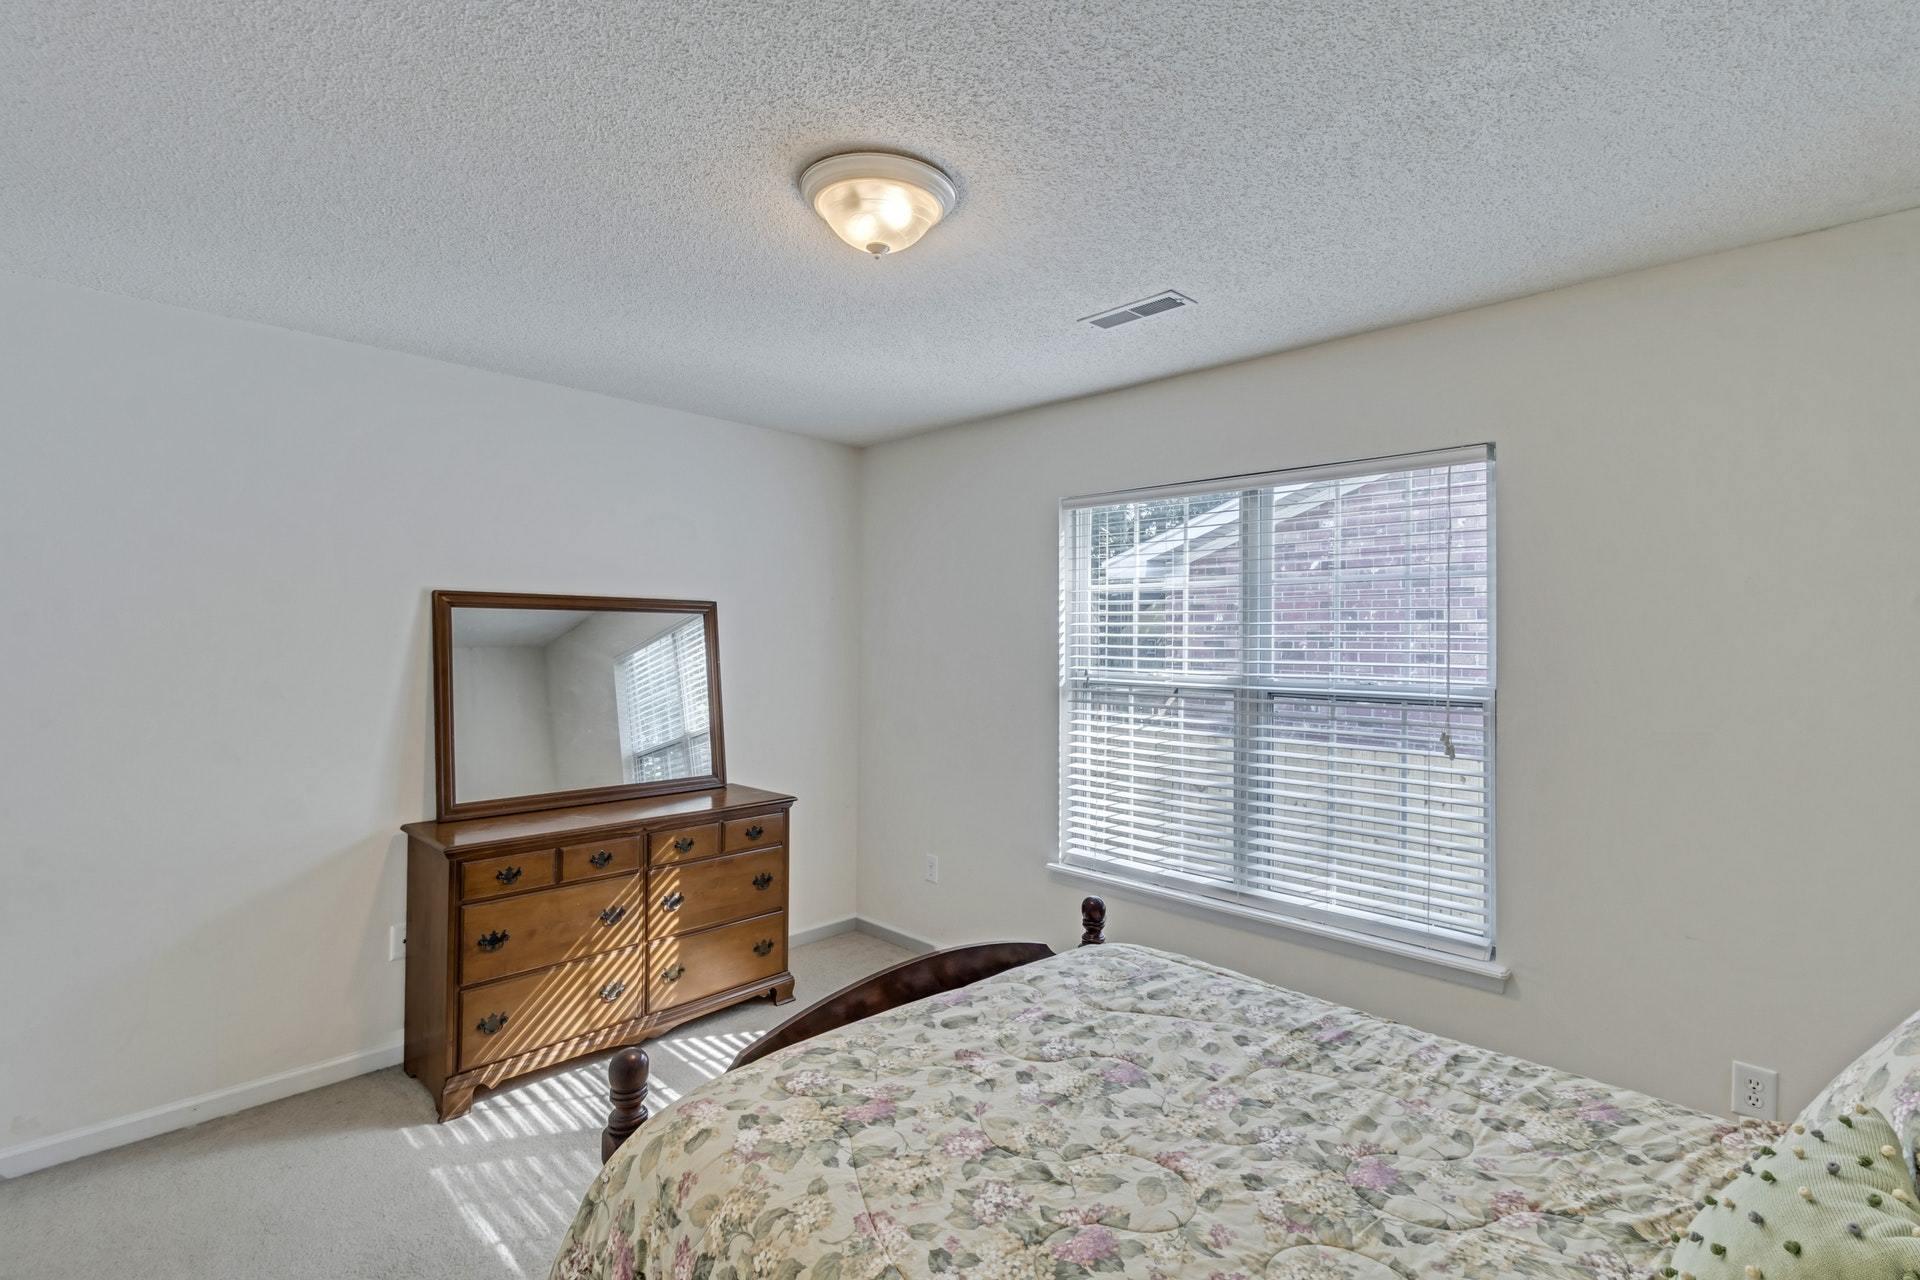 Double Oaks Homes For Sale - 2402 Double Oak, Charleston, SC - 18